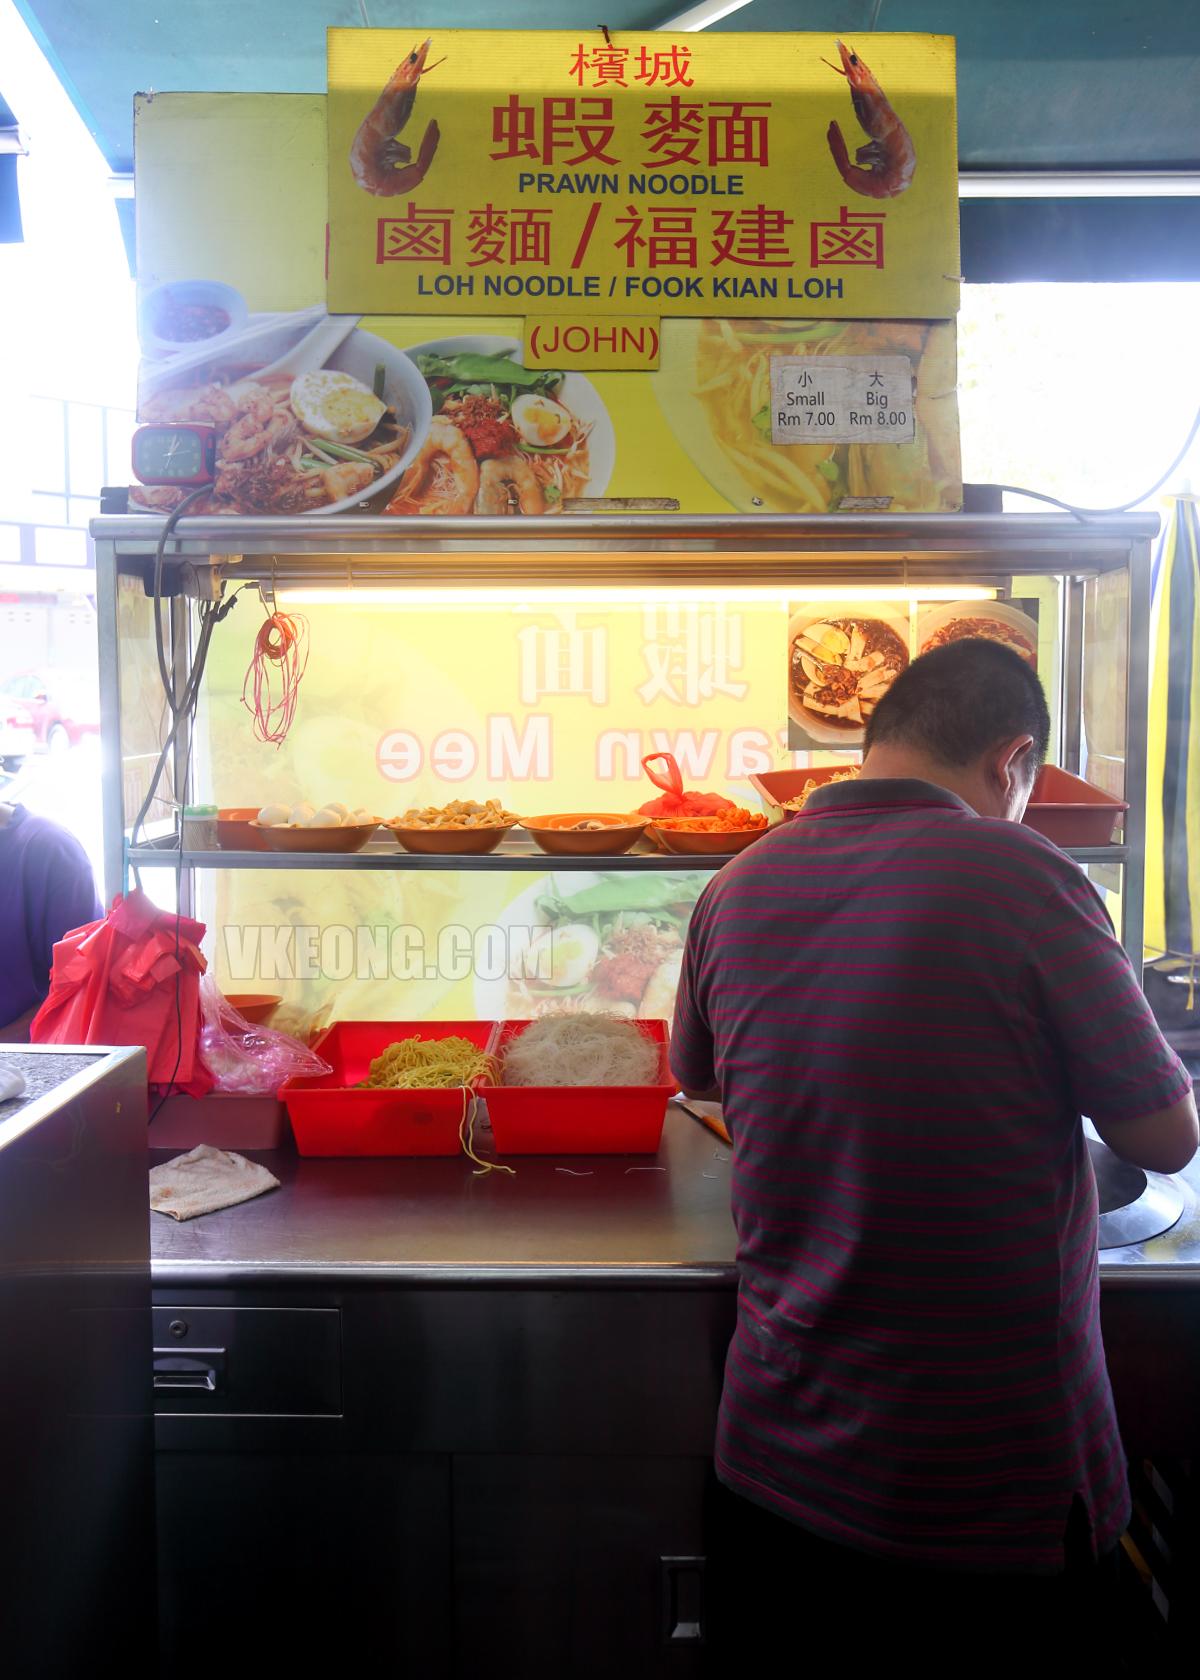 John-Penang-Prawn-Noodle-Loh-Mee